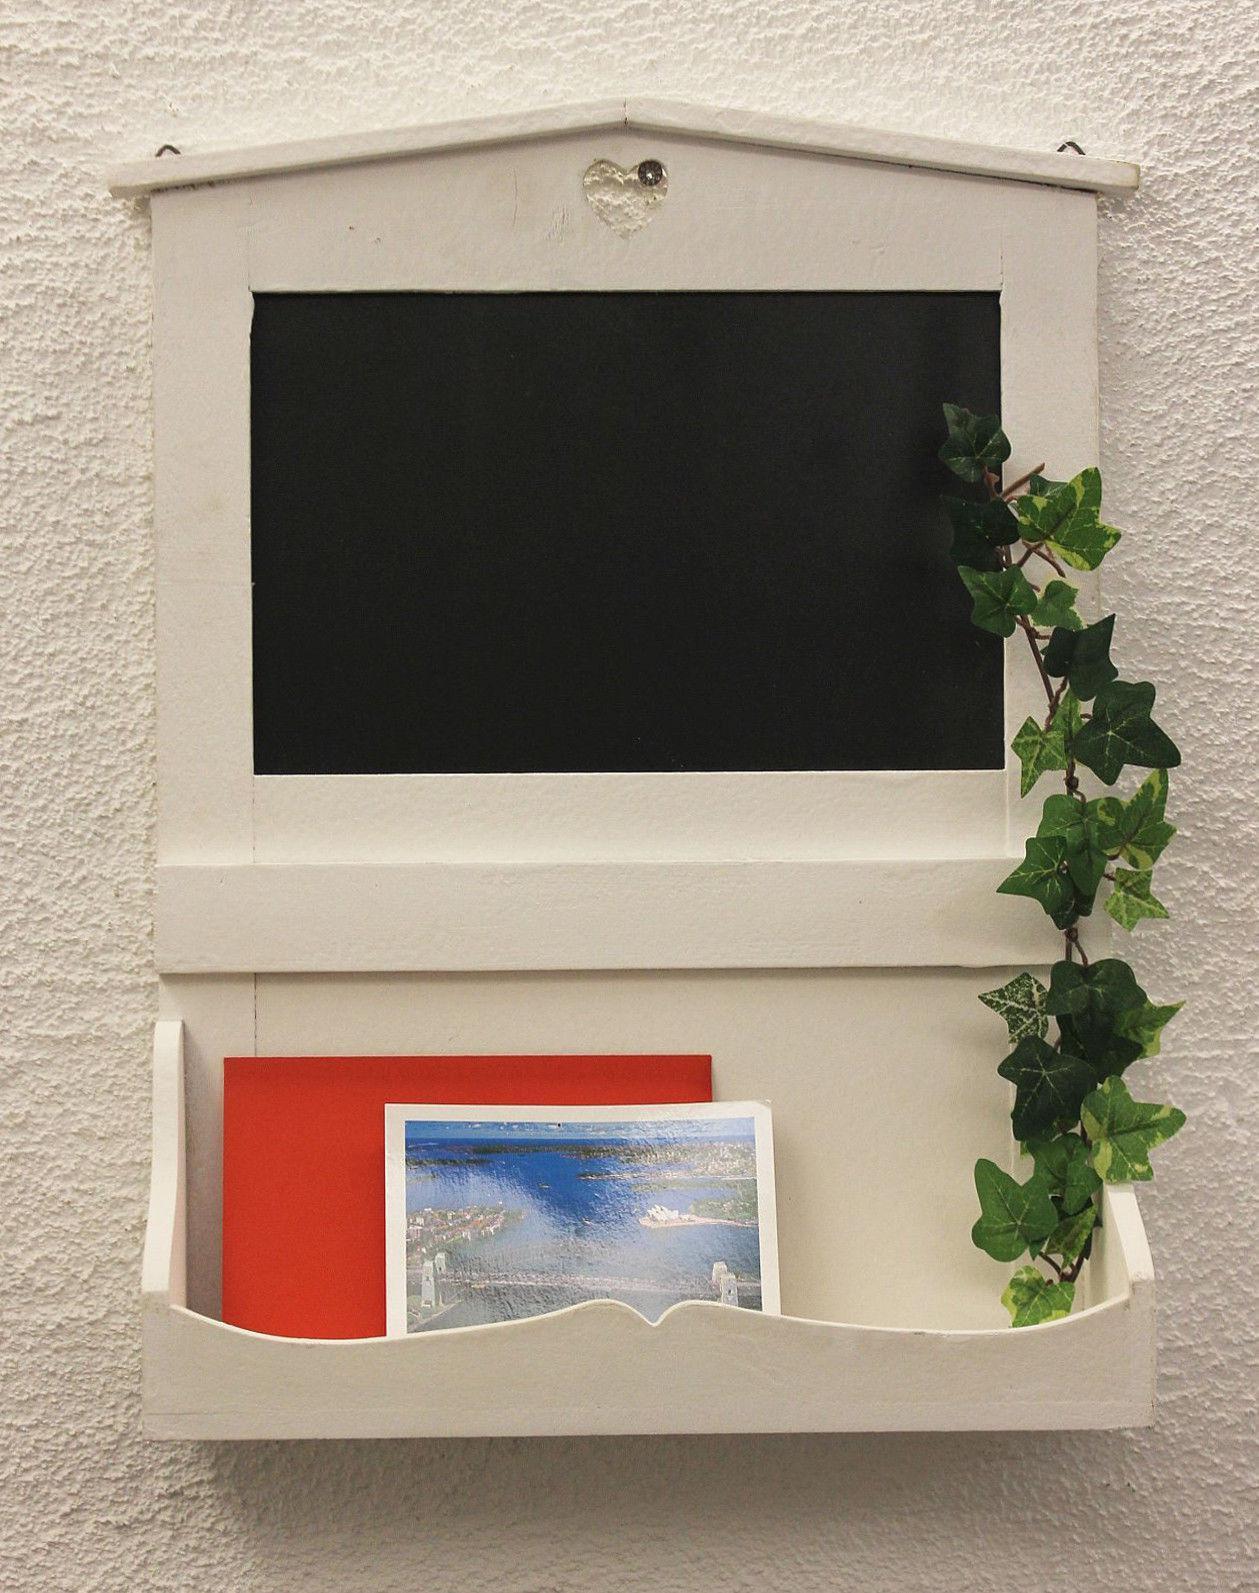 notiztafel 12041 kreidetafel 47 cm wandregal shabby memotafel infobrett briefe ebay. Black Bedroom Furniture Sets. Home Design Ideas